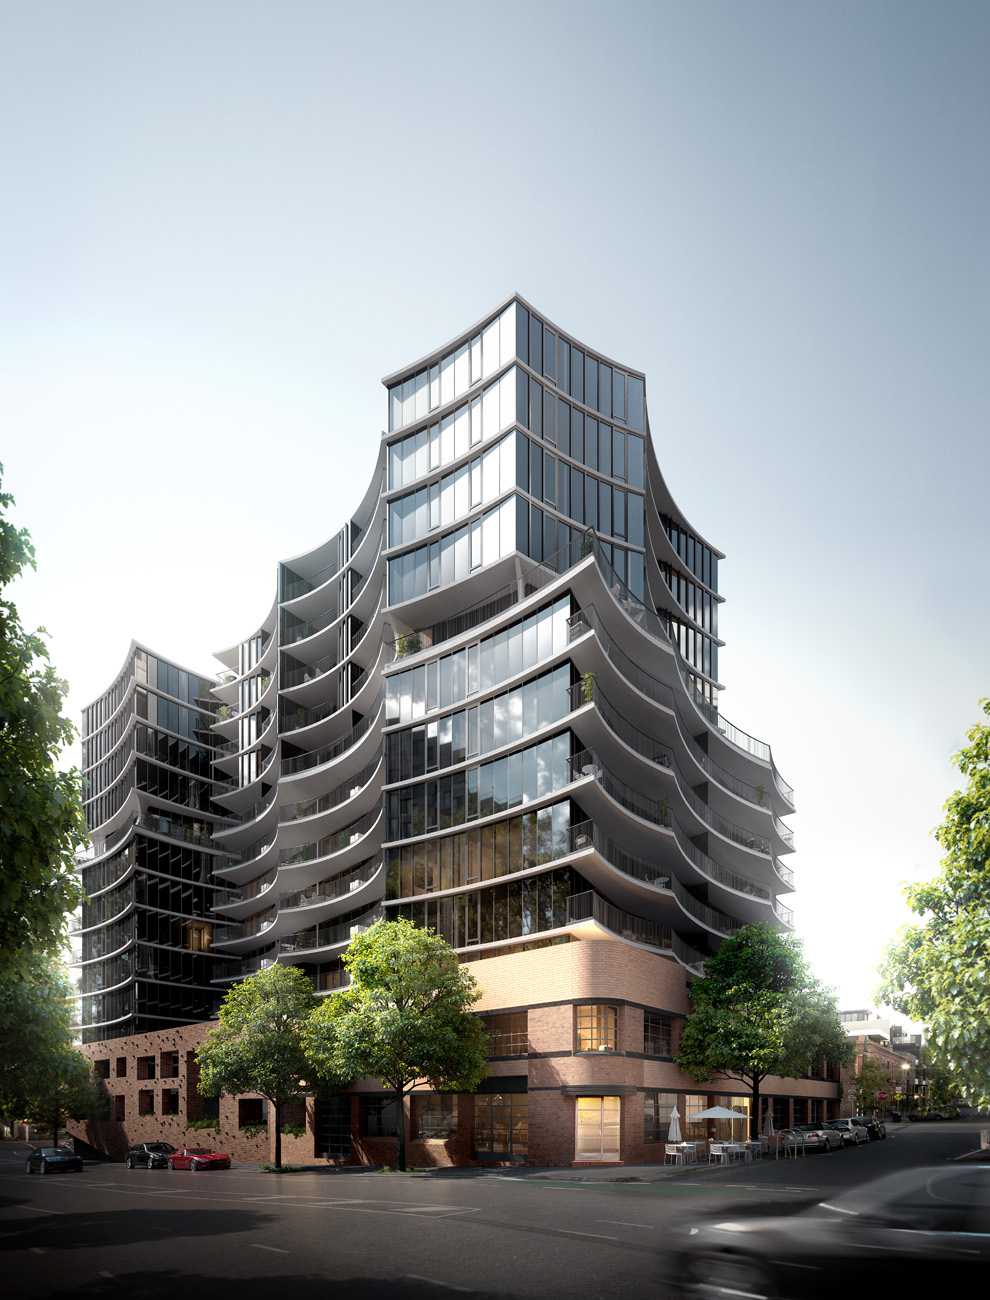 Fkd-studio-Holme-building-apartments-3d-visualisation-images